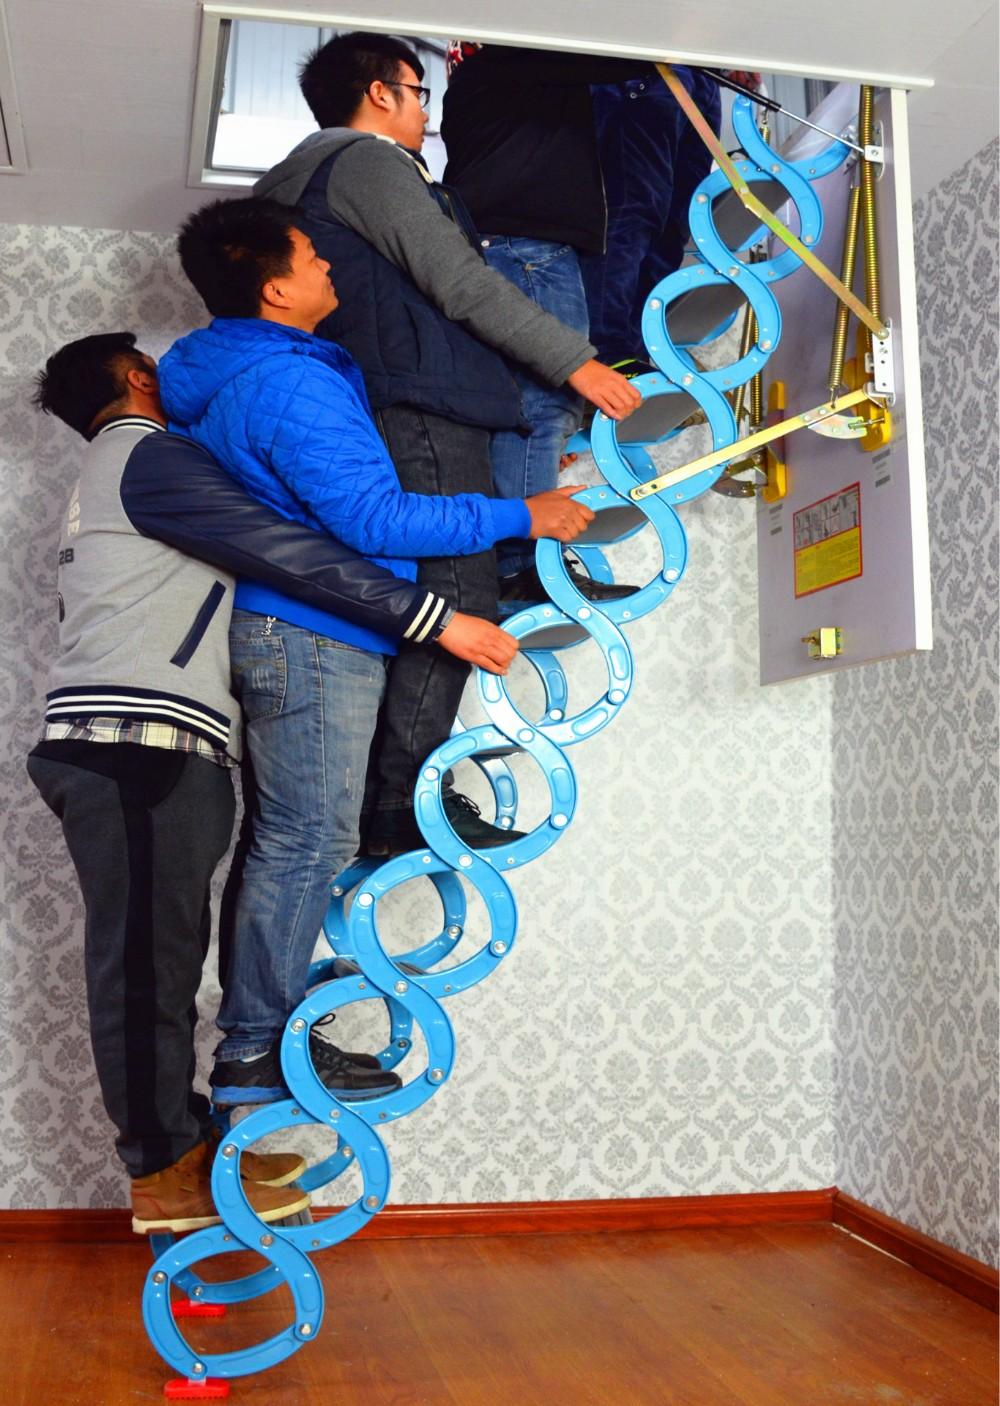 dachboden aufz ge teleskop versenkbare aluminium haushalt treppe leiter buy dachboden aufz ge. Black Bedroom Furniture Sets. Home Design Ideas